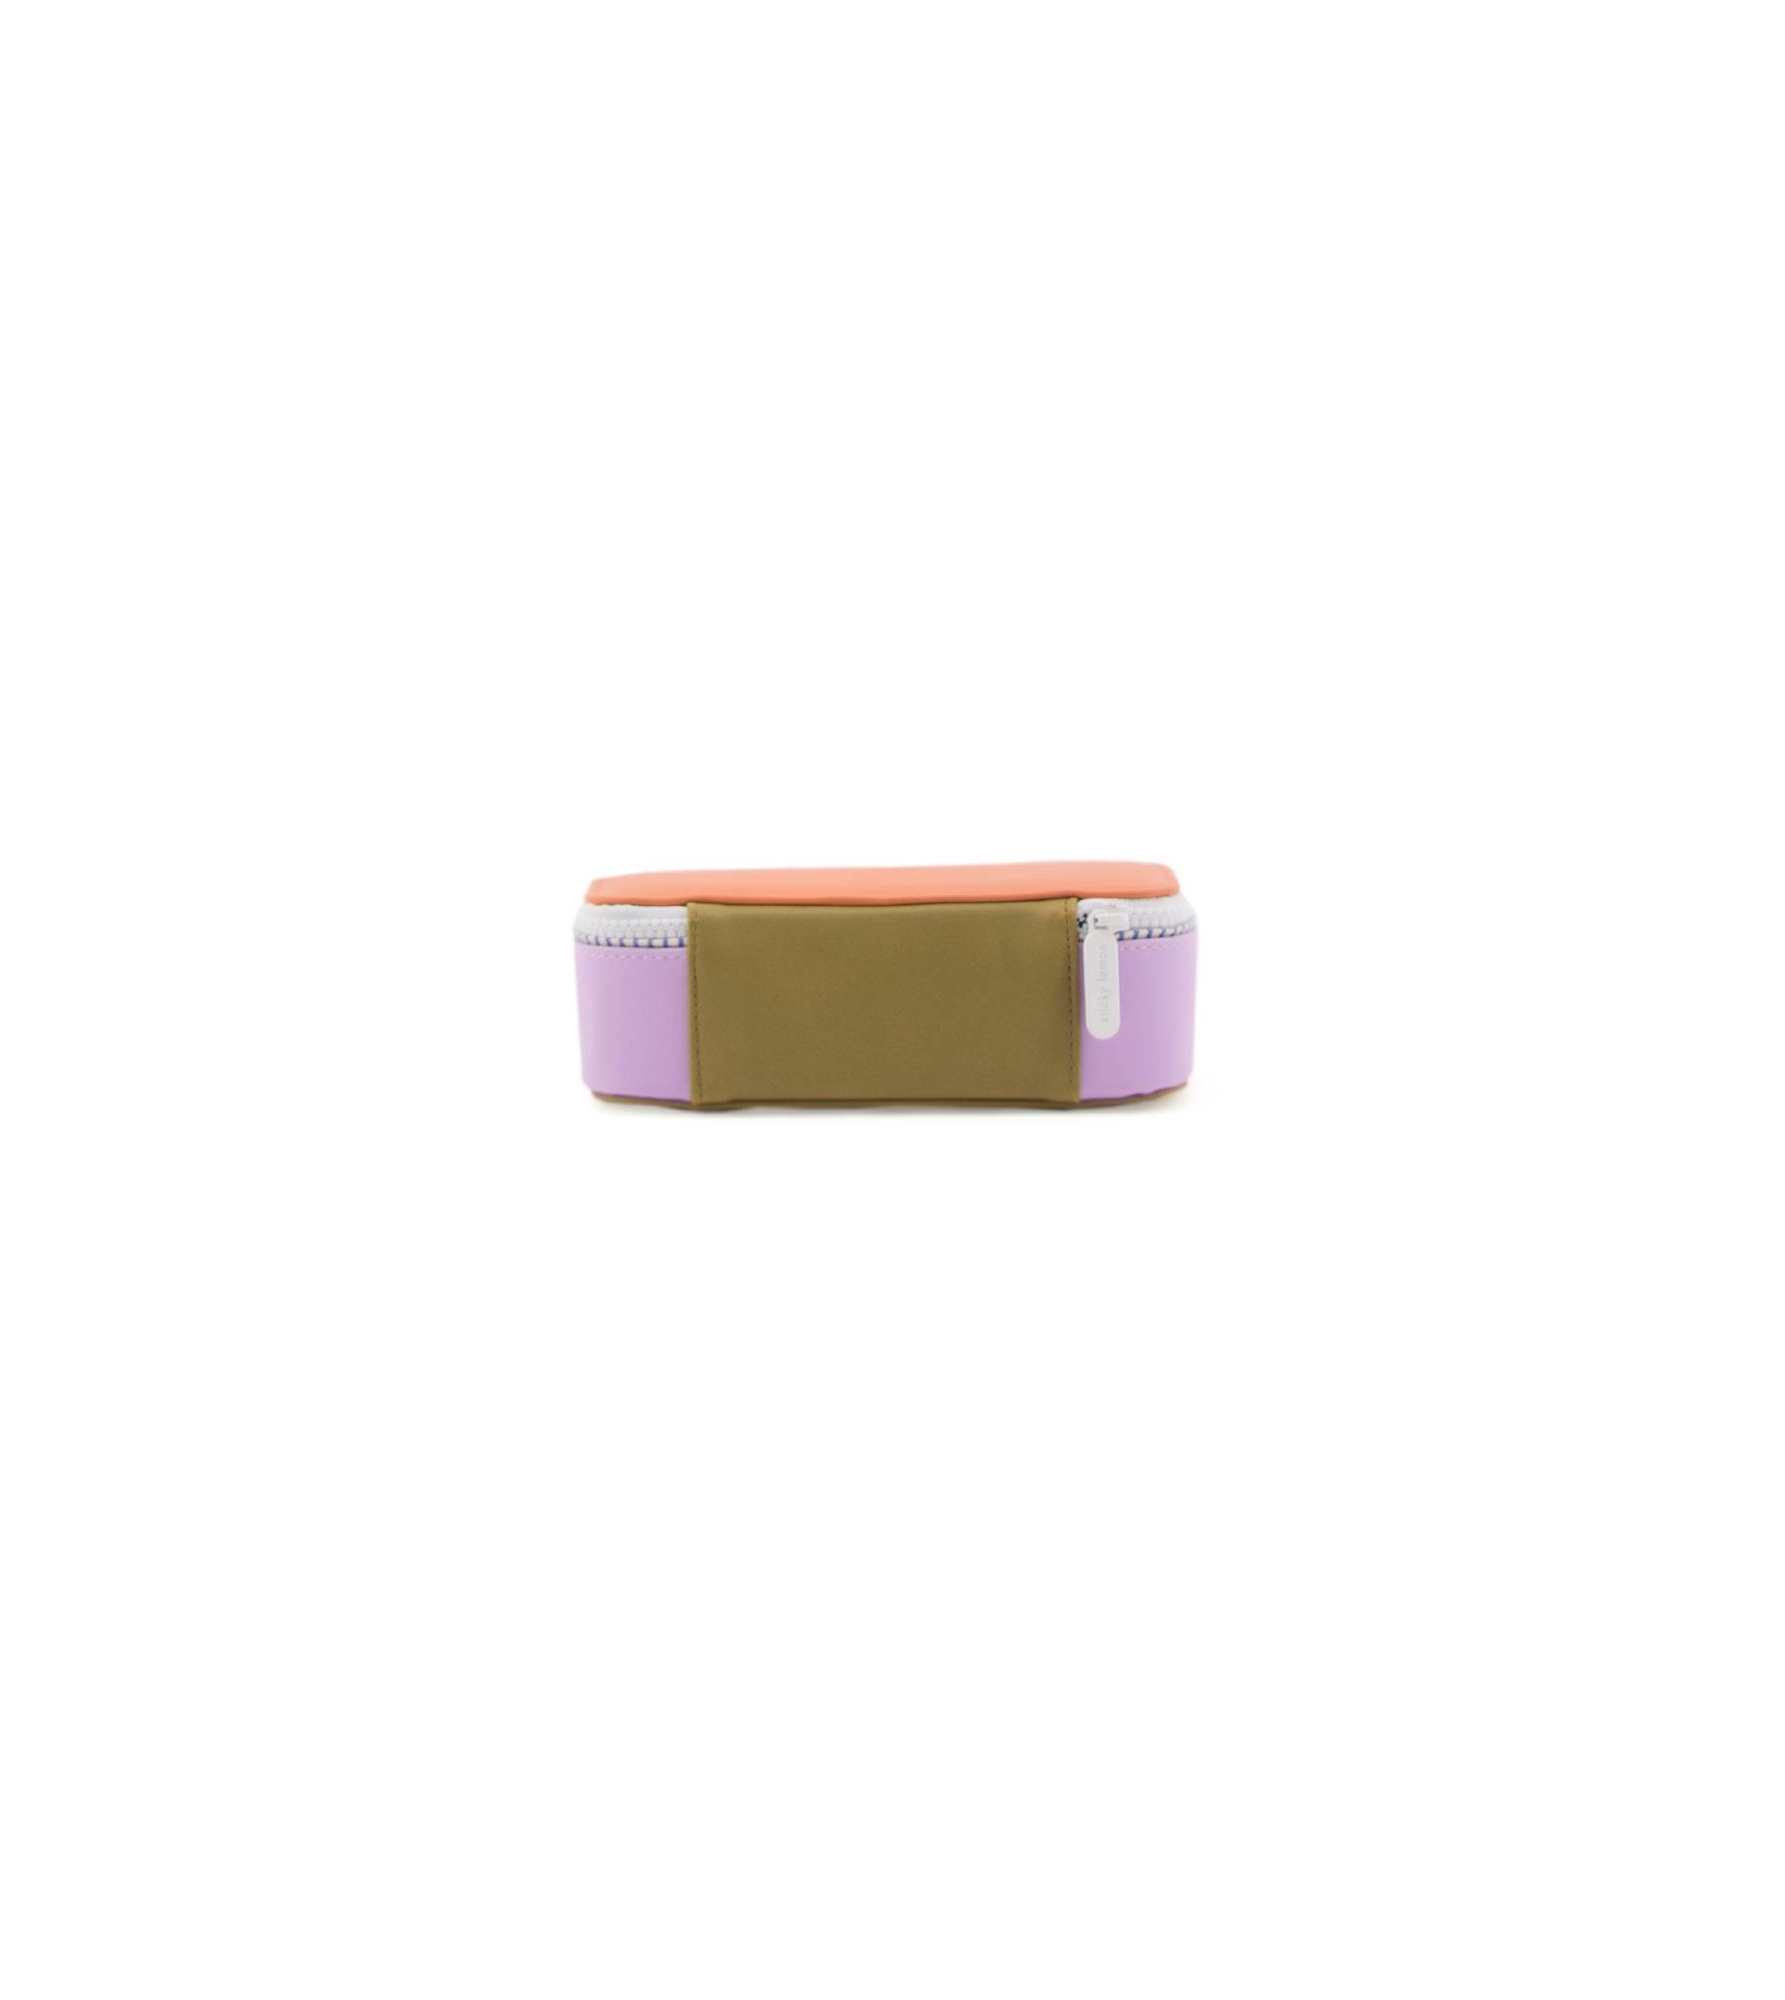 1801421 - Sticky Lemon - pencilbox - Madam olive, gustave lilac, concierge orange - back_edit.jpg